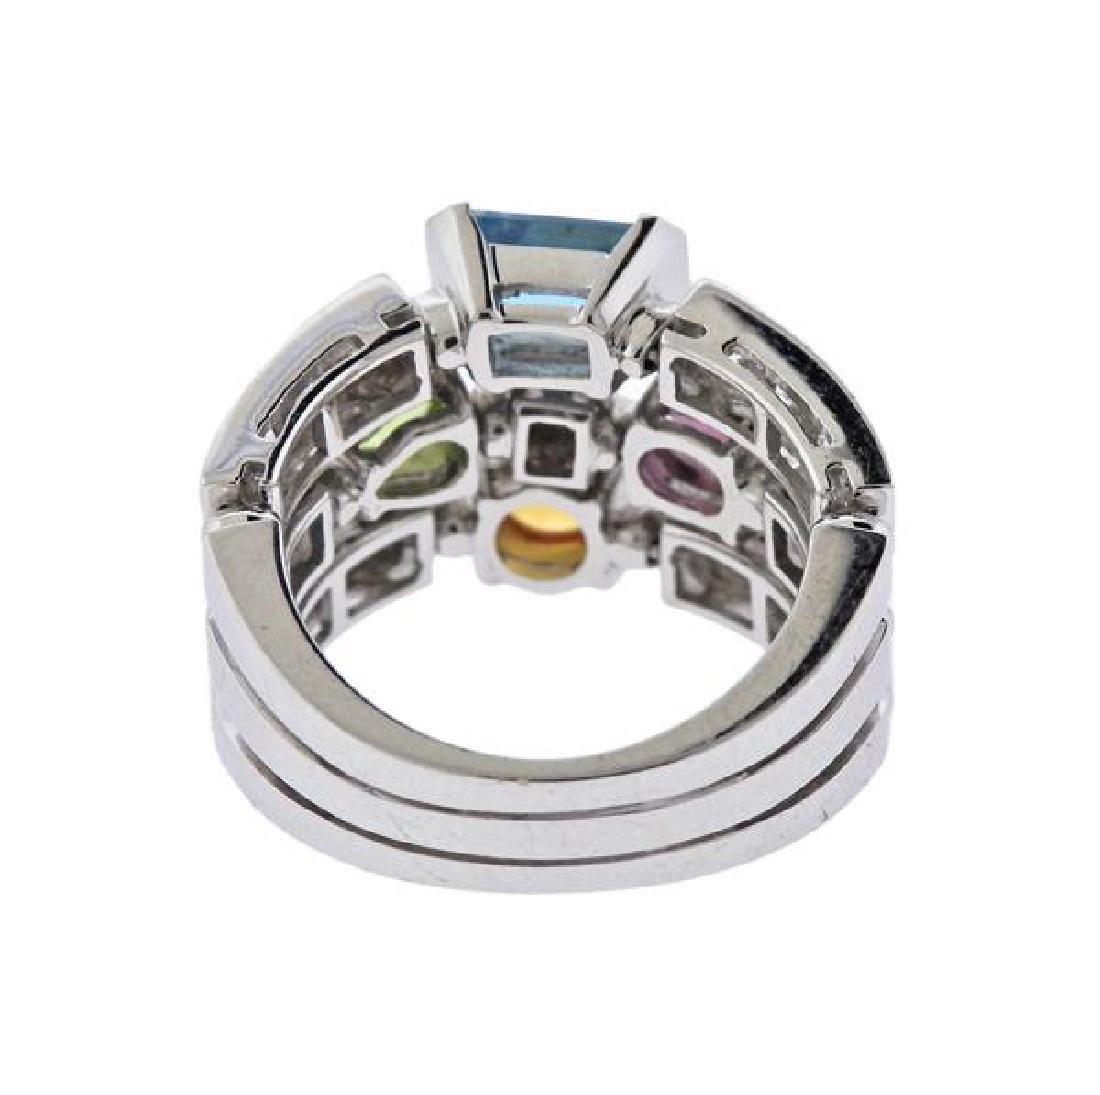 Bulgari Bvlgari Allegra 18K Gold Diamond Gemstone Ring - 3